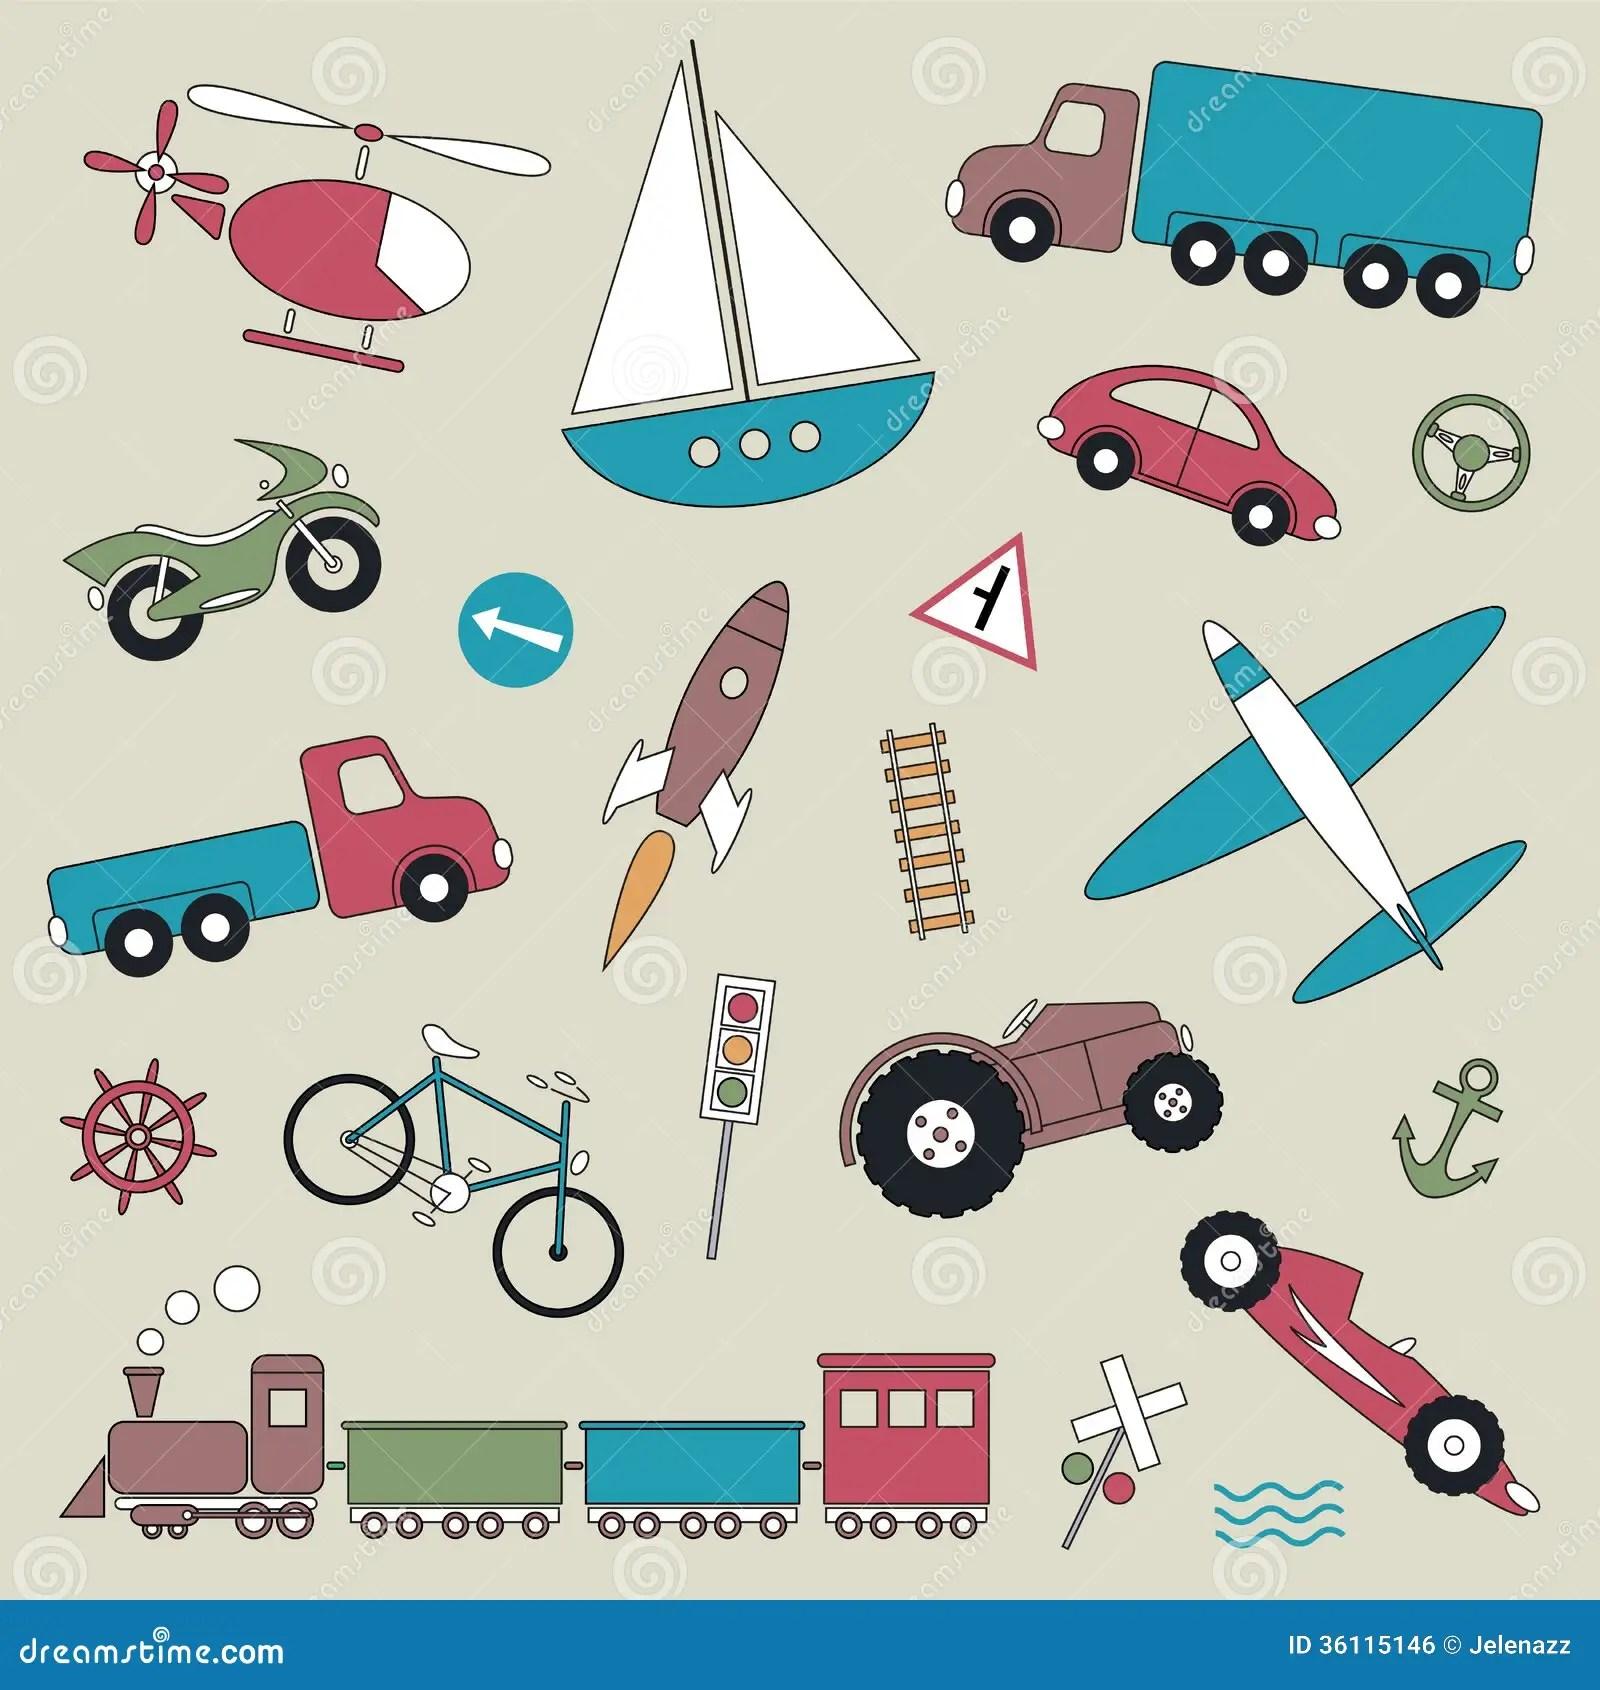 Transportation Vehicles Collection Illustration Stock